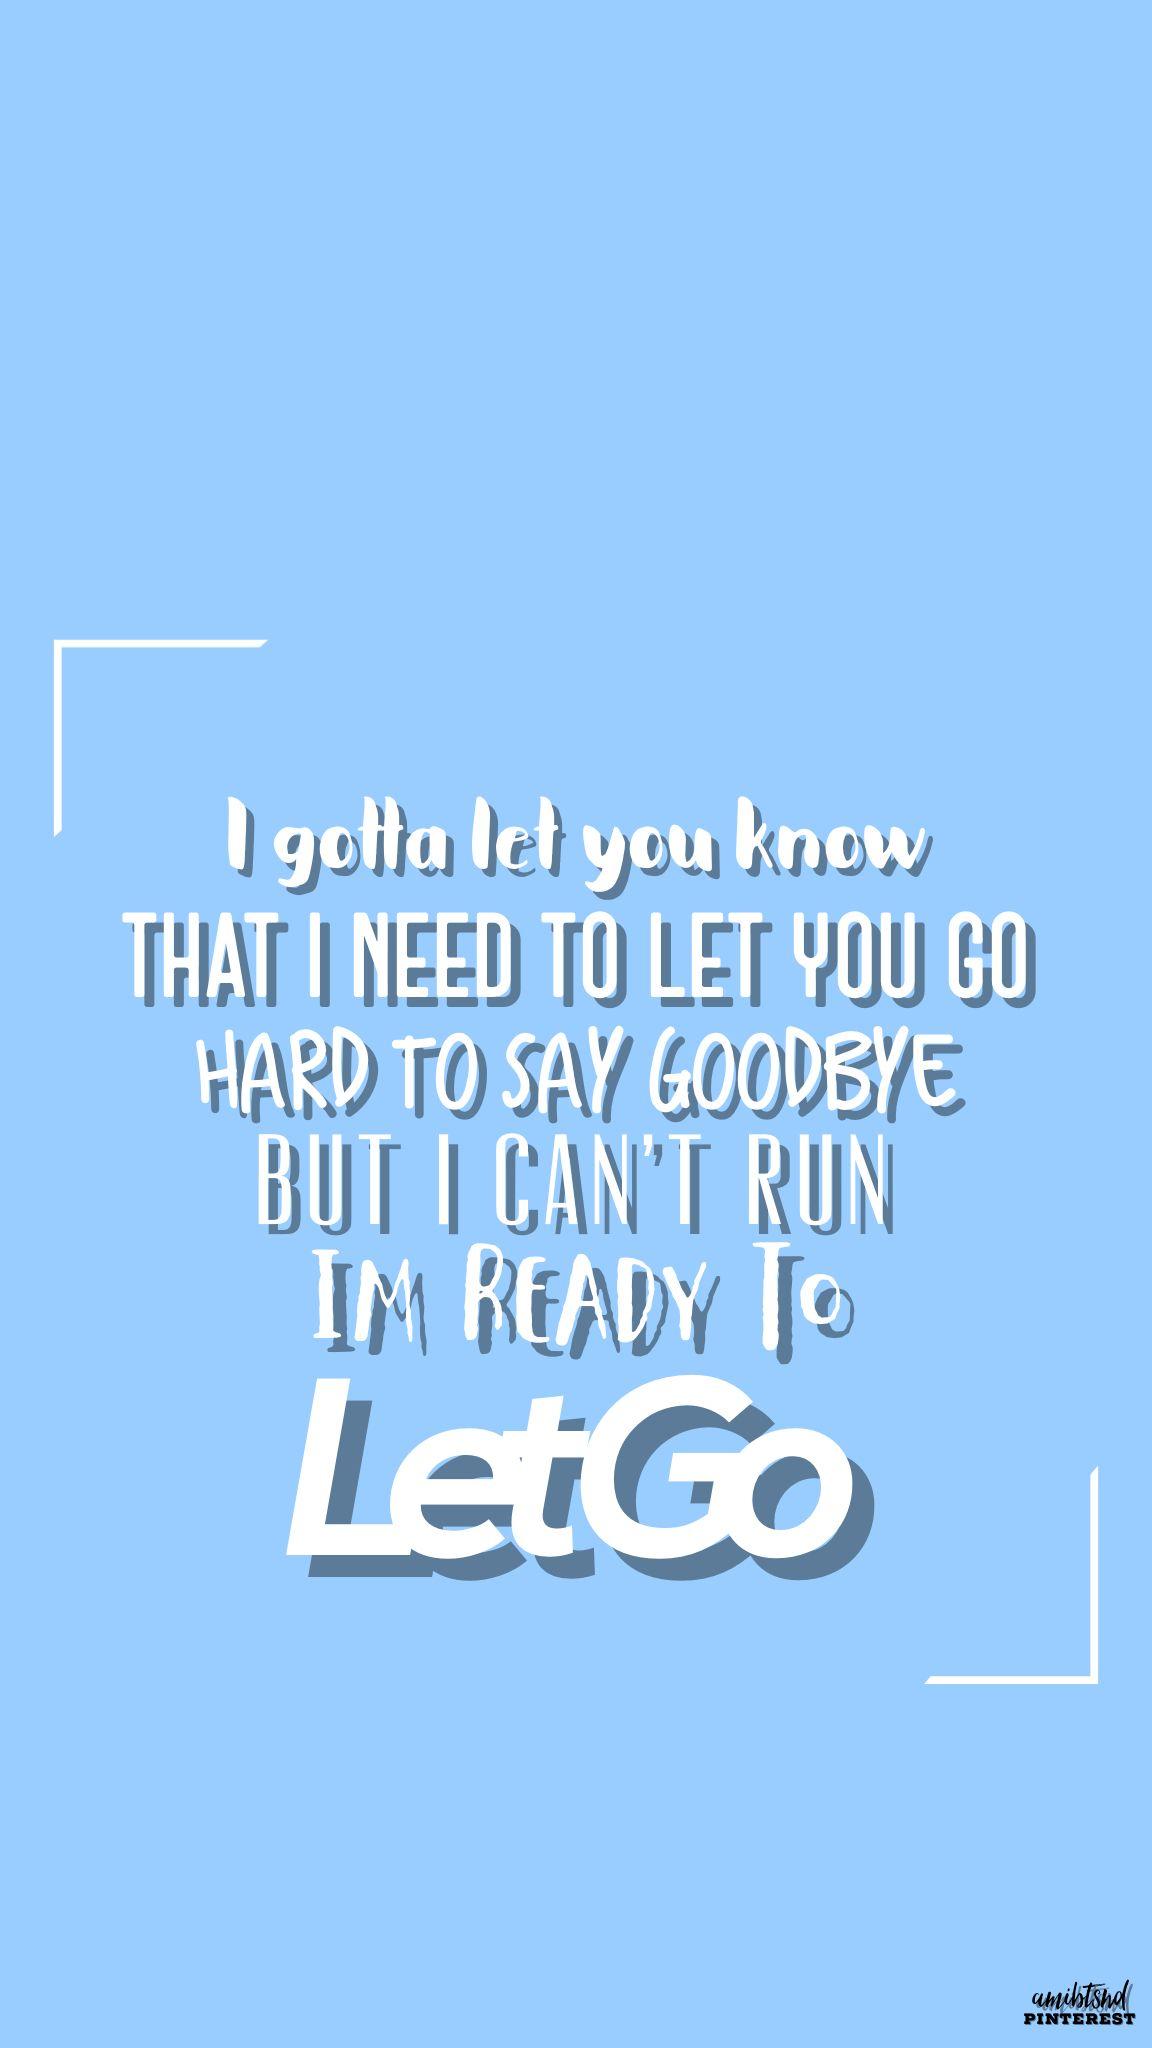 Bts Wallpaper Let Go Lyrics Bts Lyrics Quotes Bts Lyric Bts Quotes